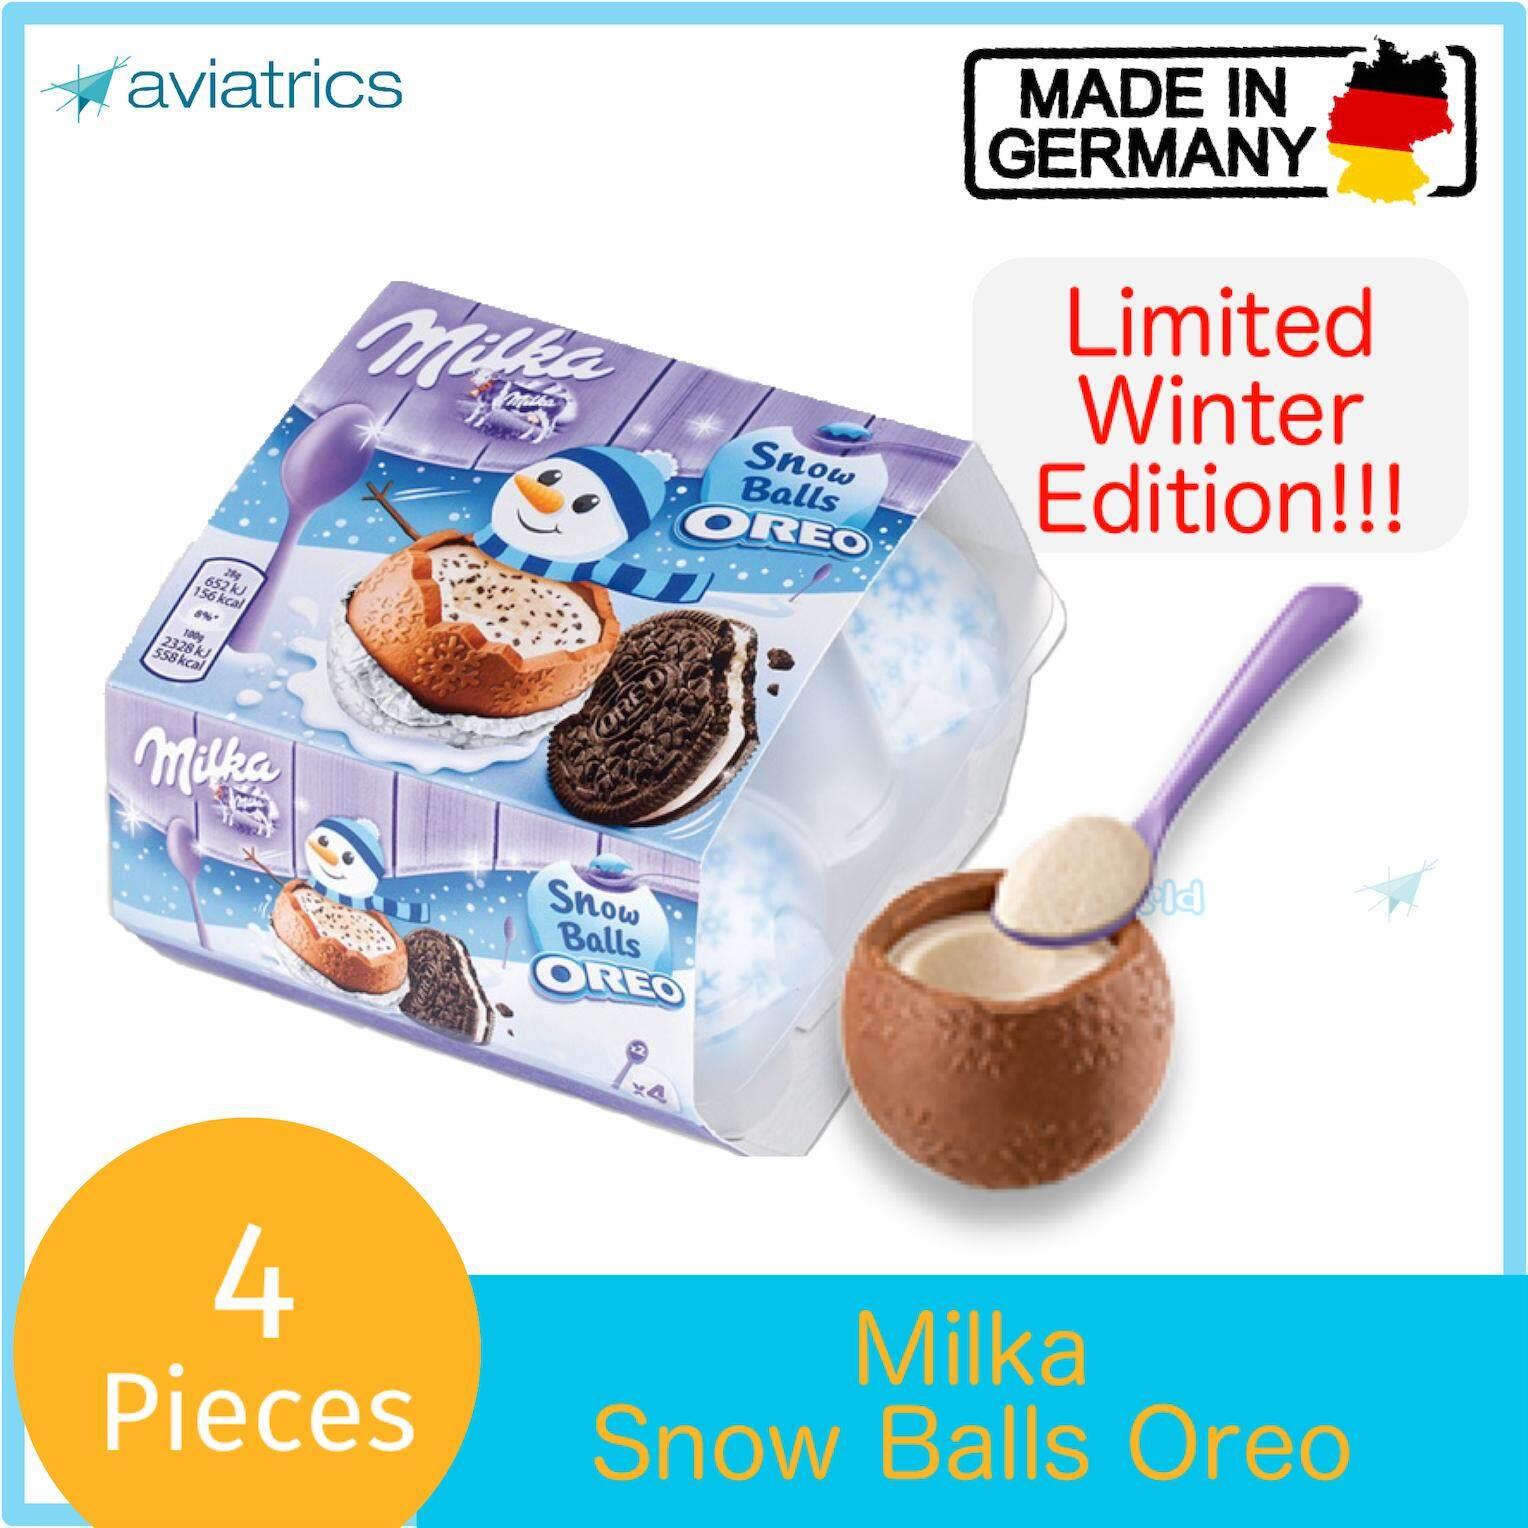 Milka Oreo Snow Ball Chocolate 4pc 112g (Made in Germany)